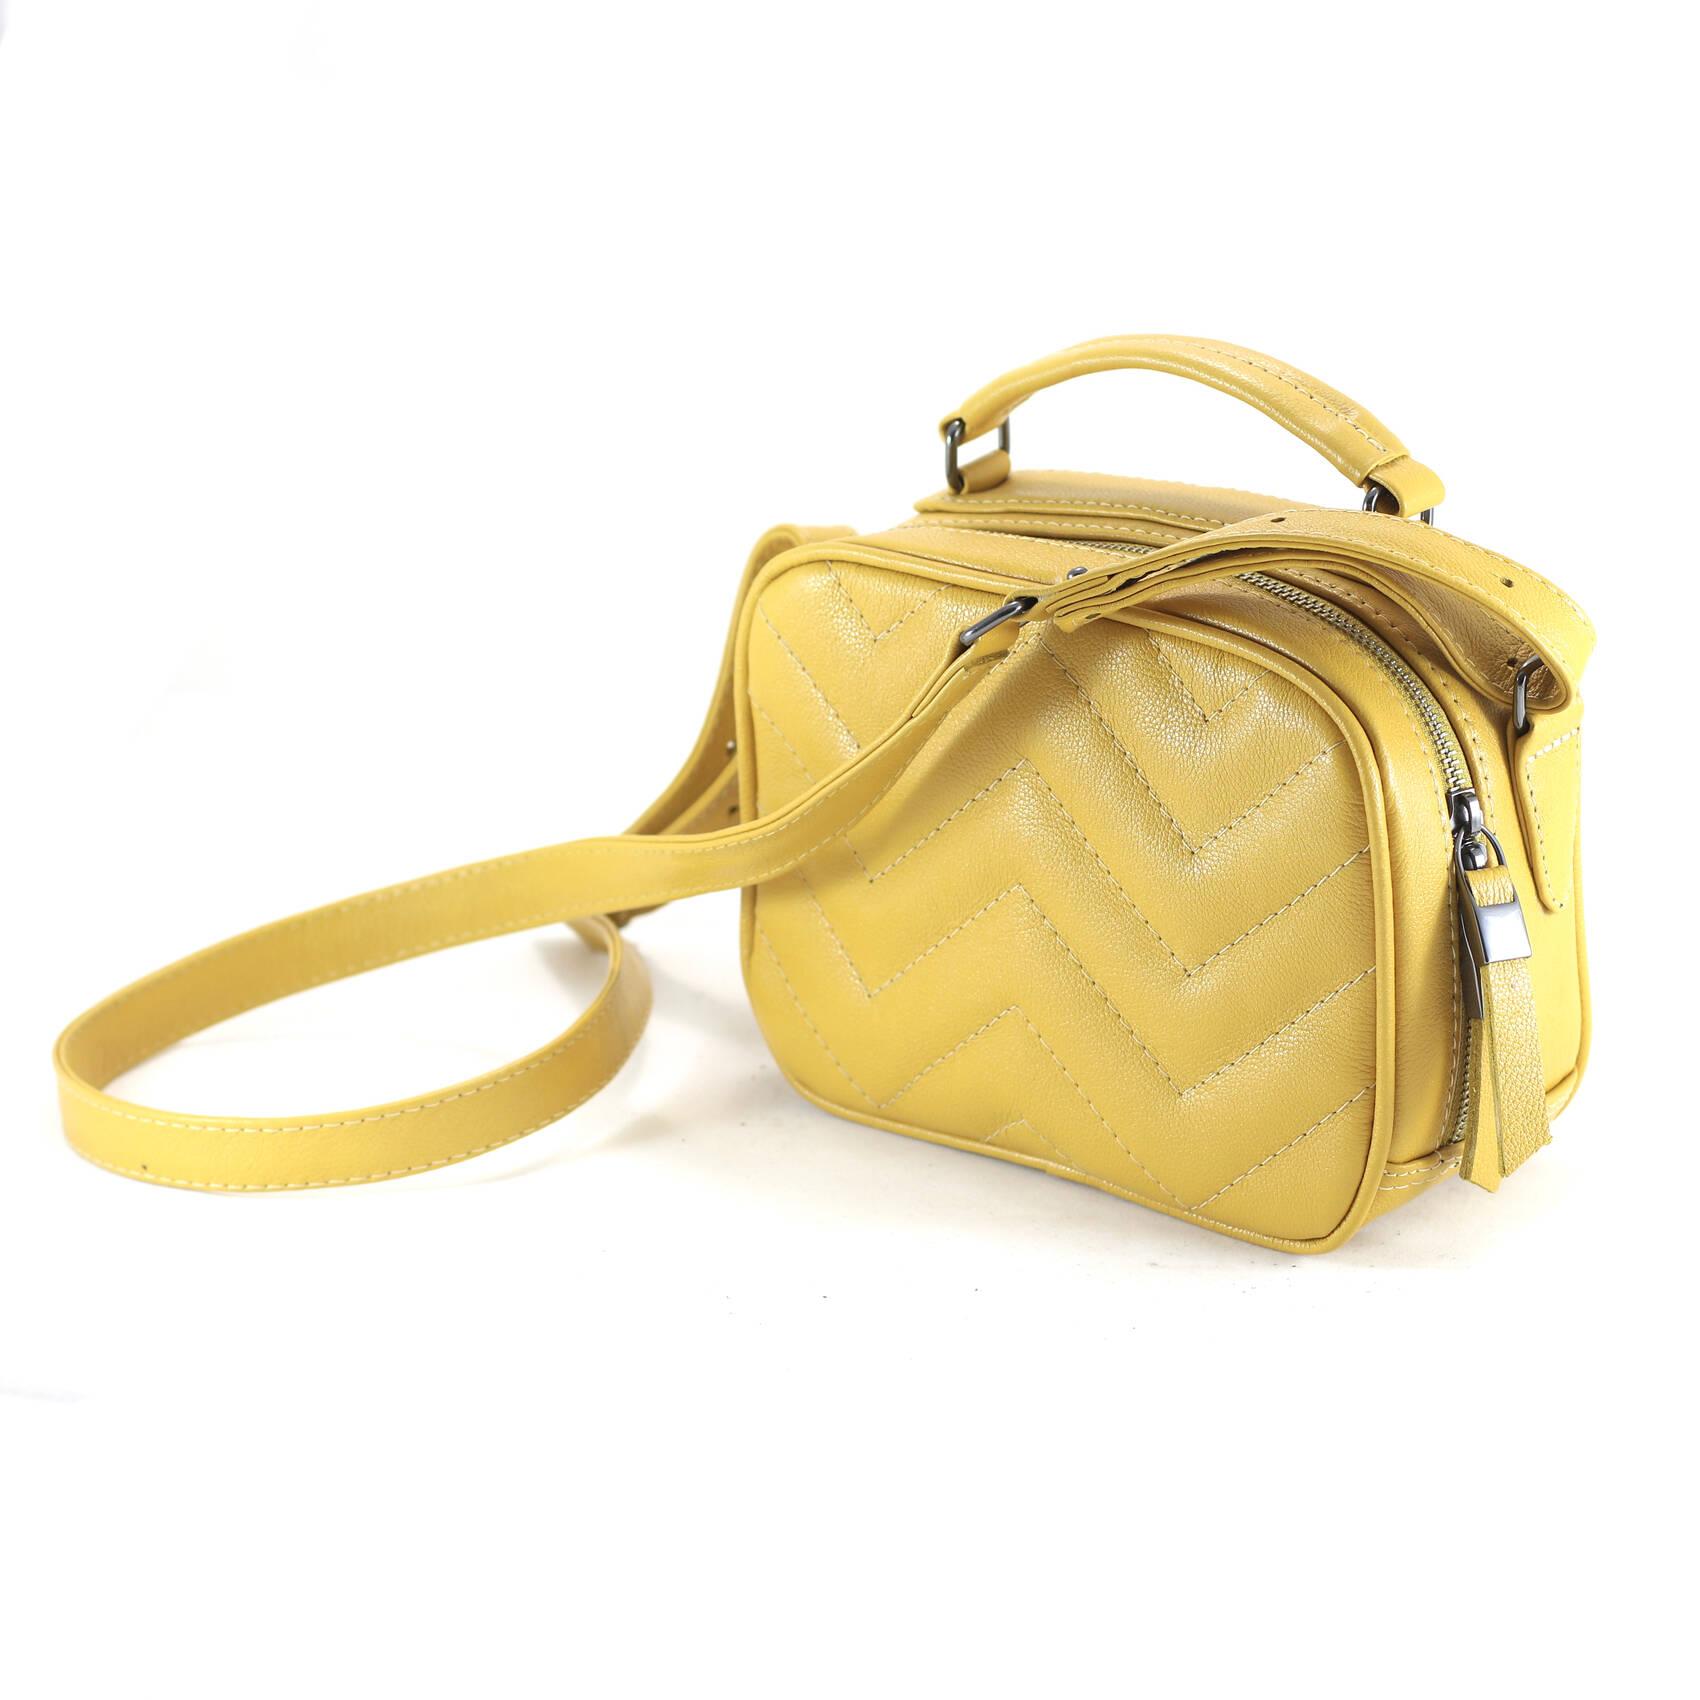 SANTORINI Bolsa quadradinha basica couro legitimo amarela